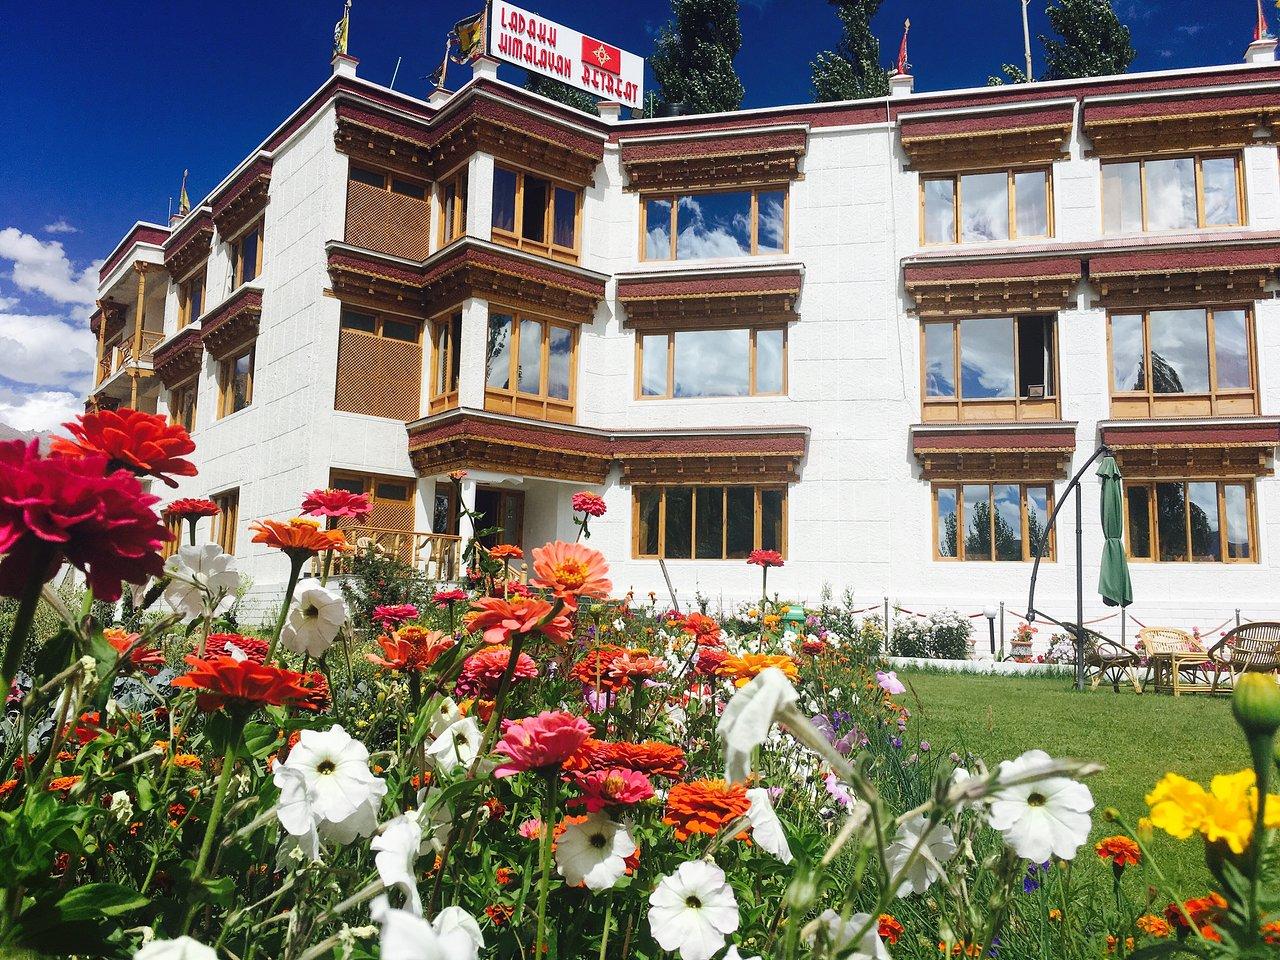 ladakh himalayan retreat 75 1 0 8 updated 2019 prices rh tripadvisor com